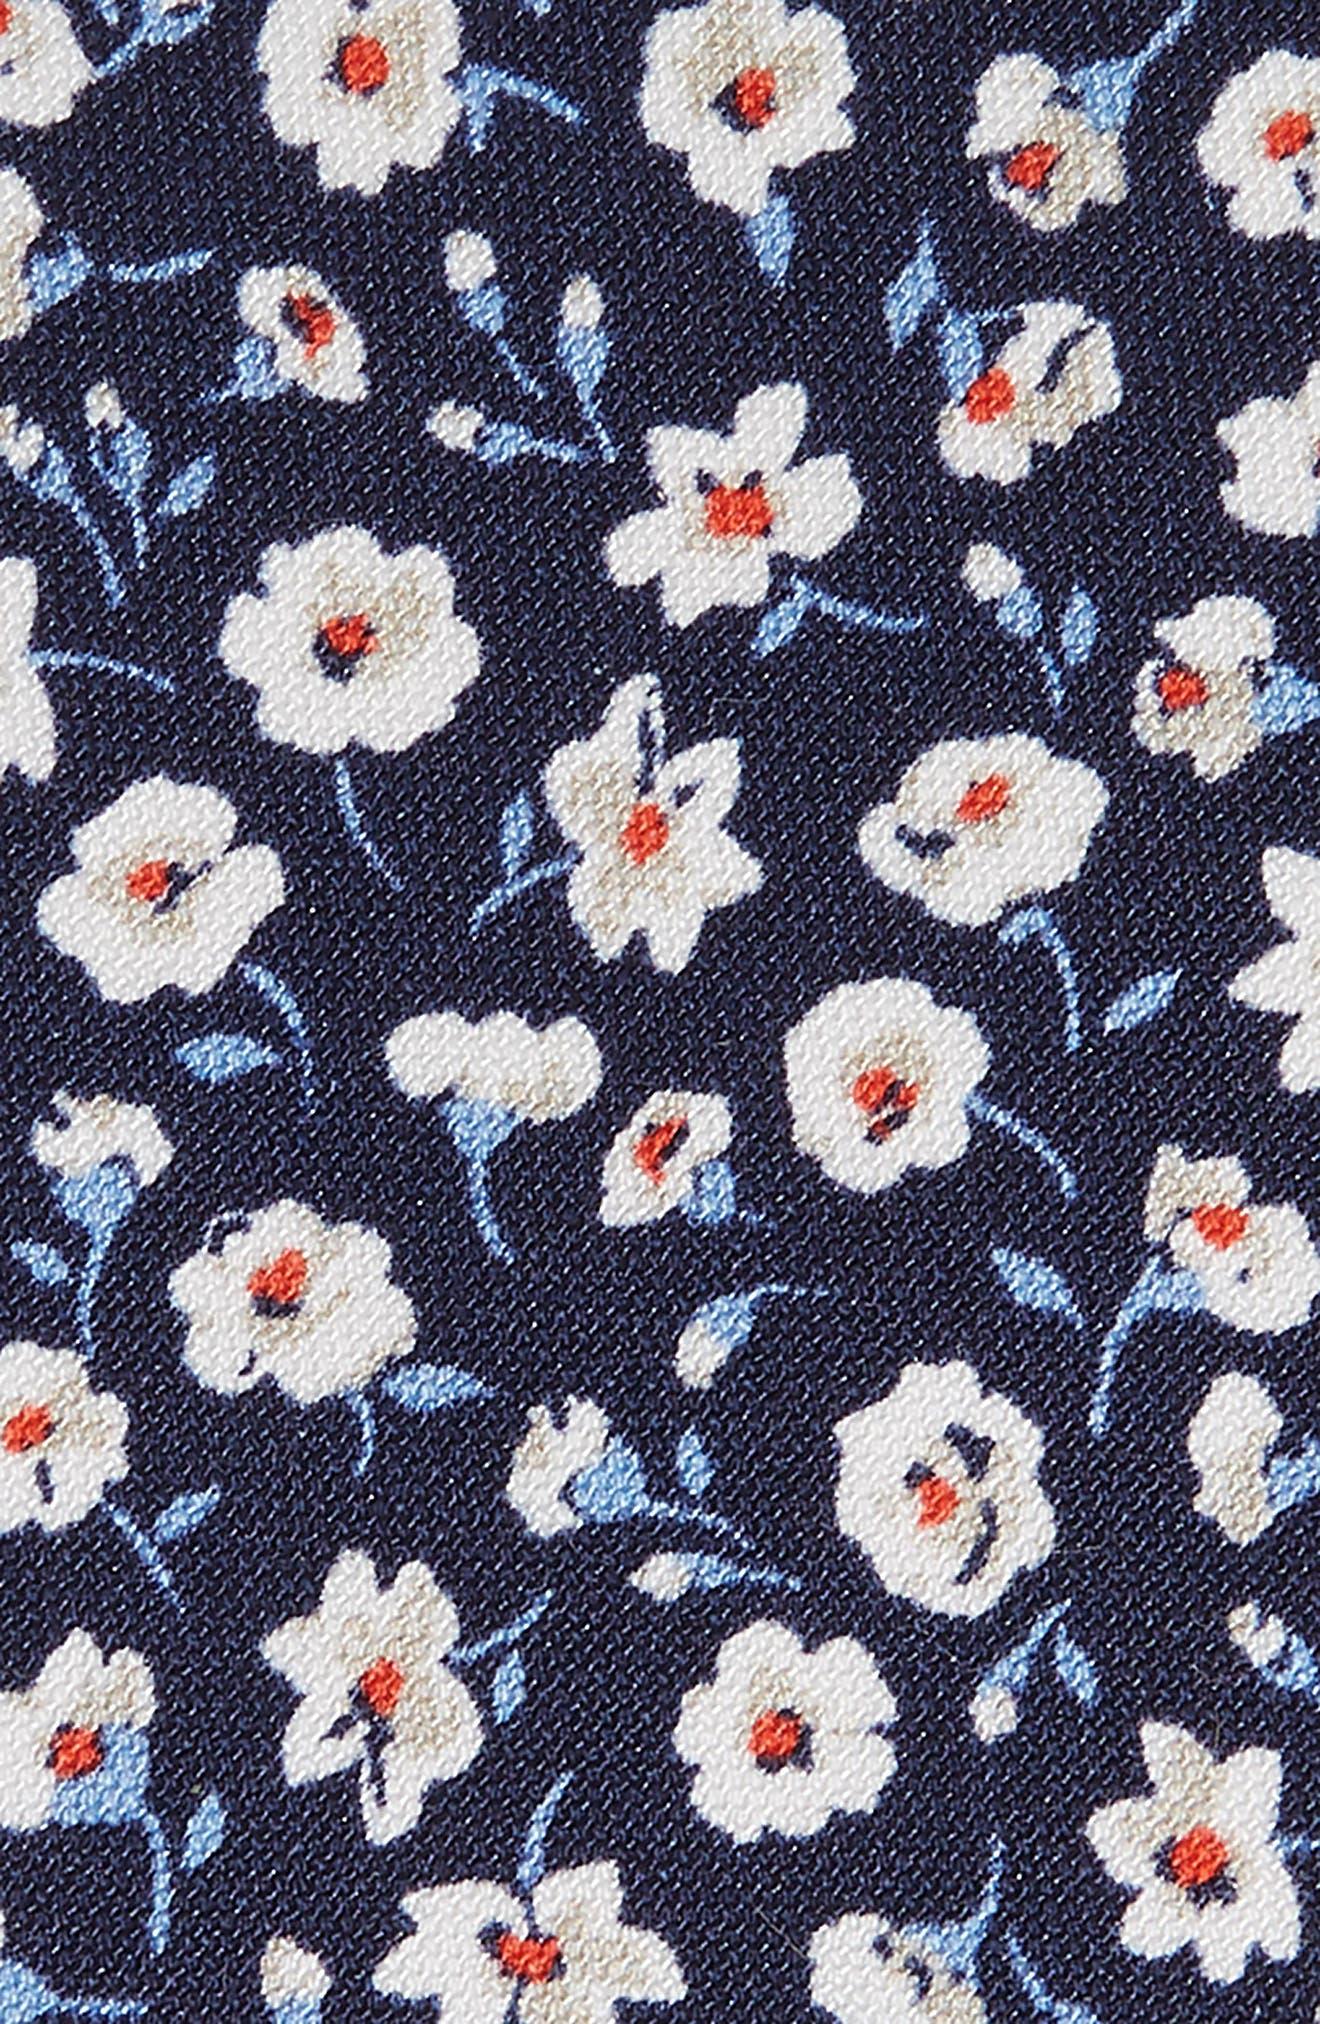 Floral Cotton & Silk Tie,                             Alternate thumbnail 2, color,                             NAVY